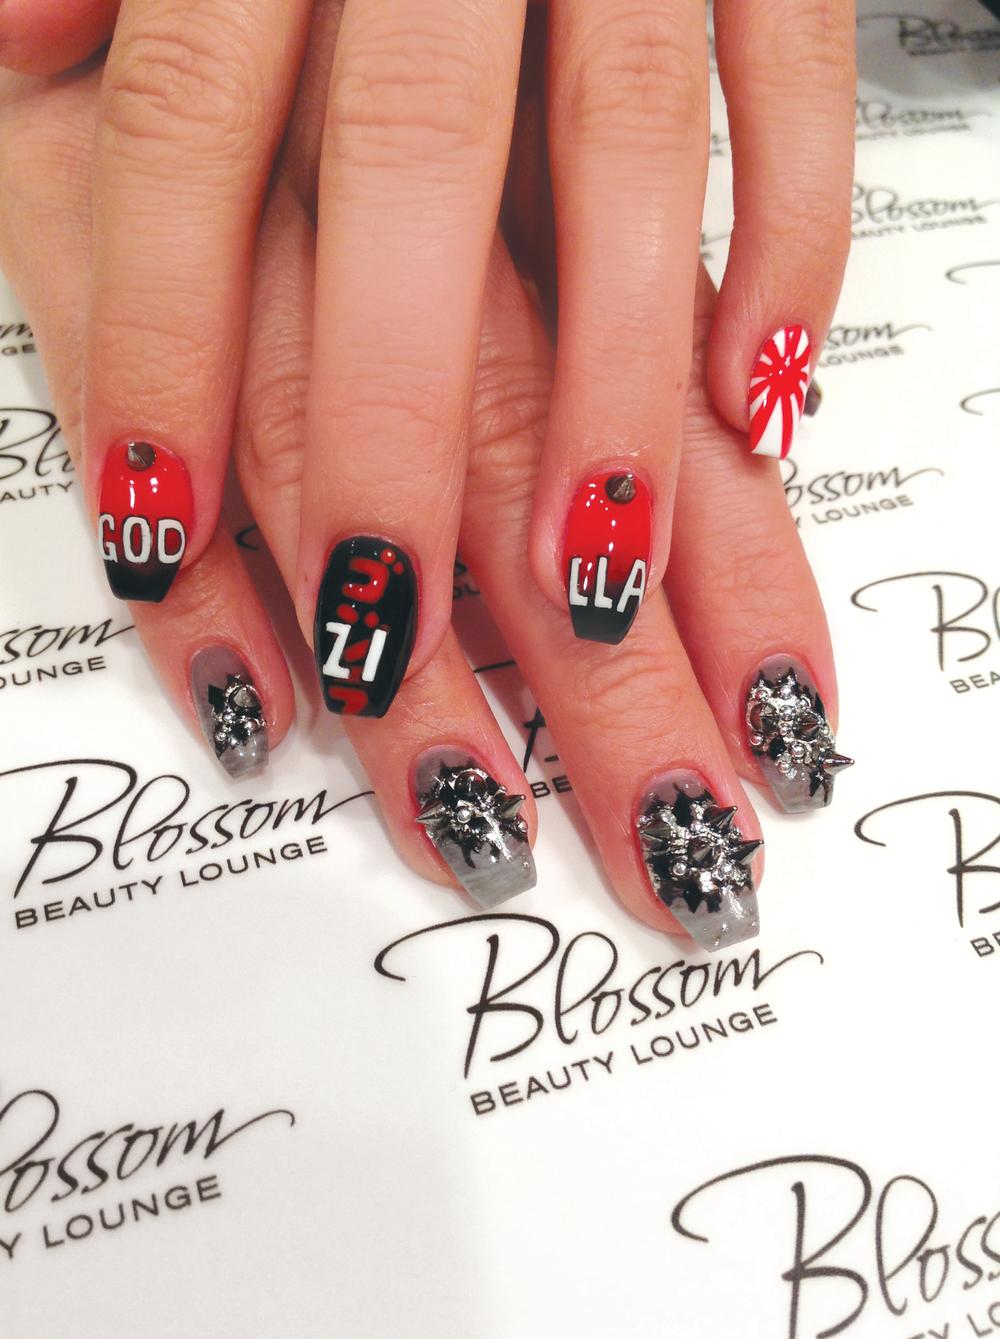 <p>Cammy Nguyen, Blossom Beauty Lounge, Redondo Beach, Calif. (Instagram: @blossombeautylounge)</p>